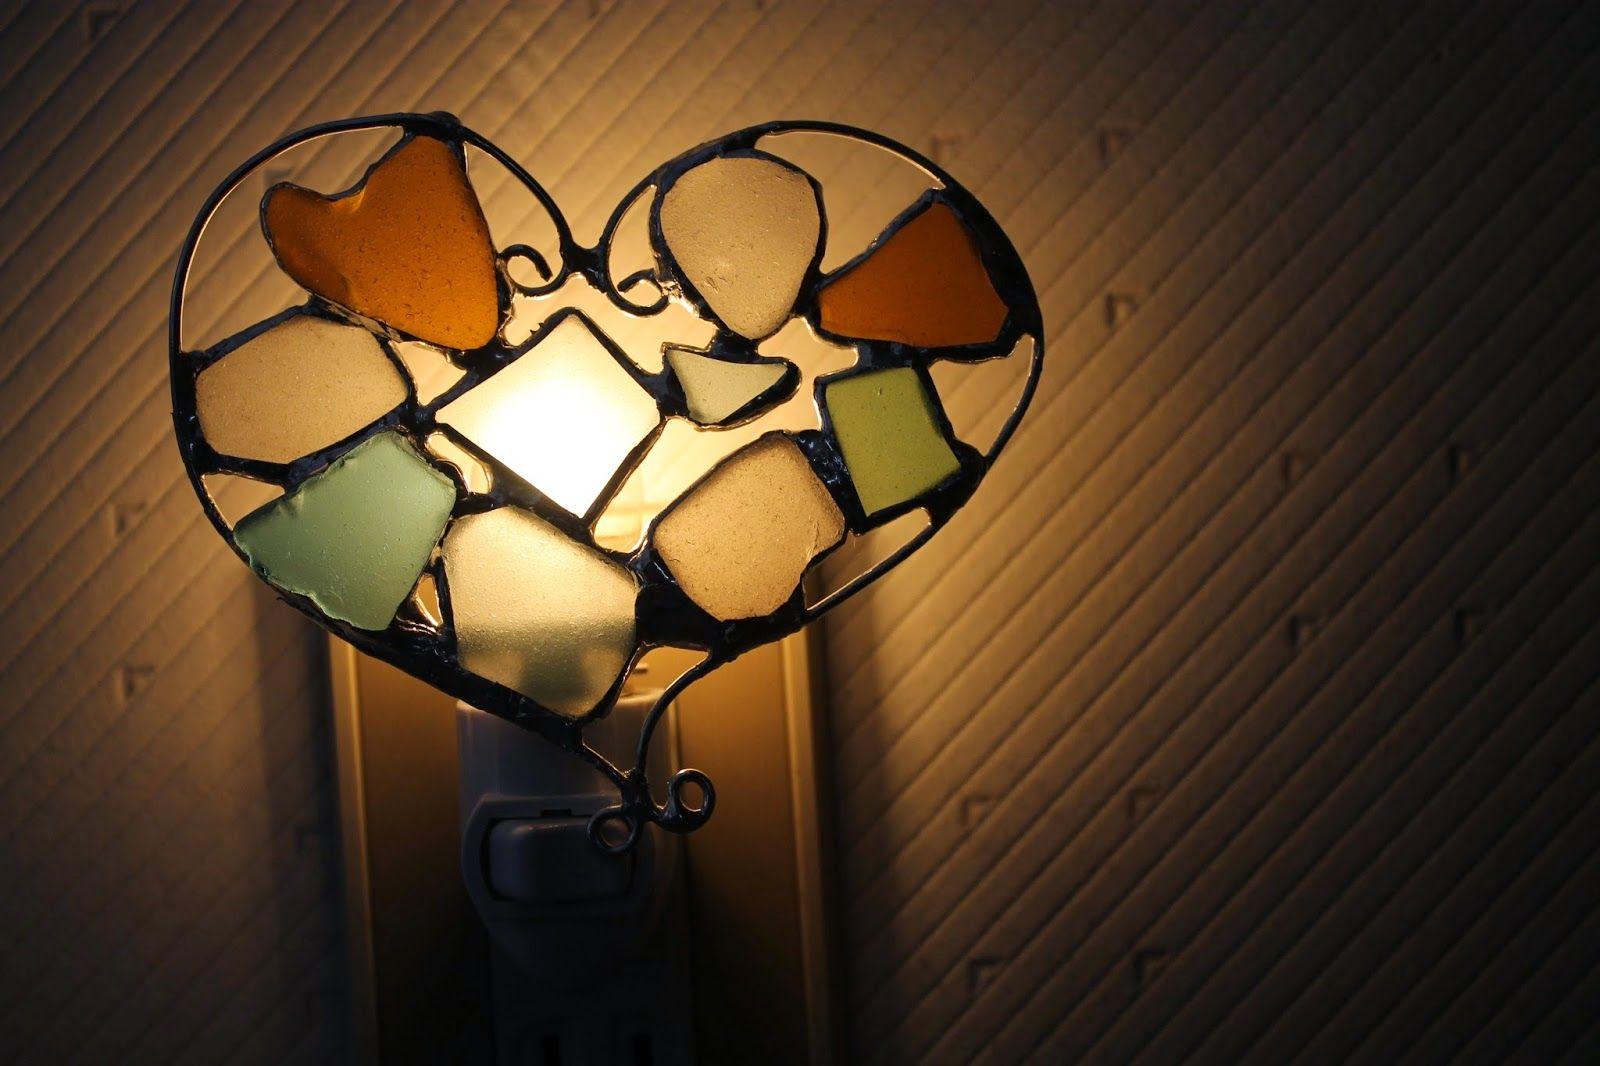 Omaezaki Natural Style: ハートのナイトライト - 愛のコミュニケーションシーグラスステンドアート教室より